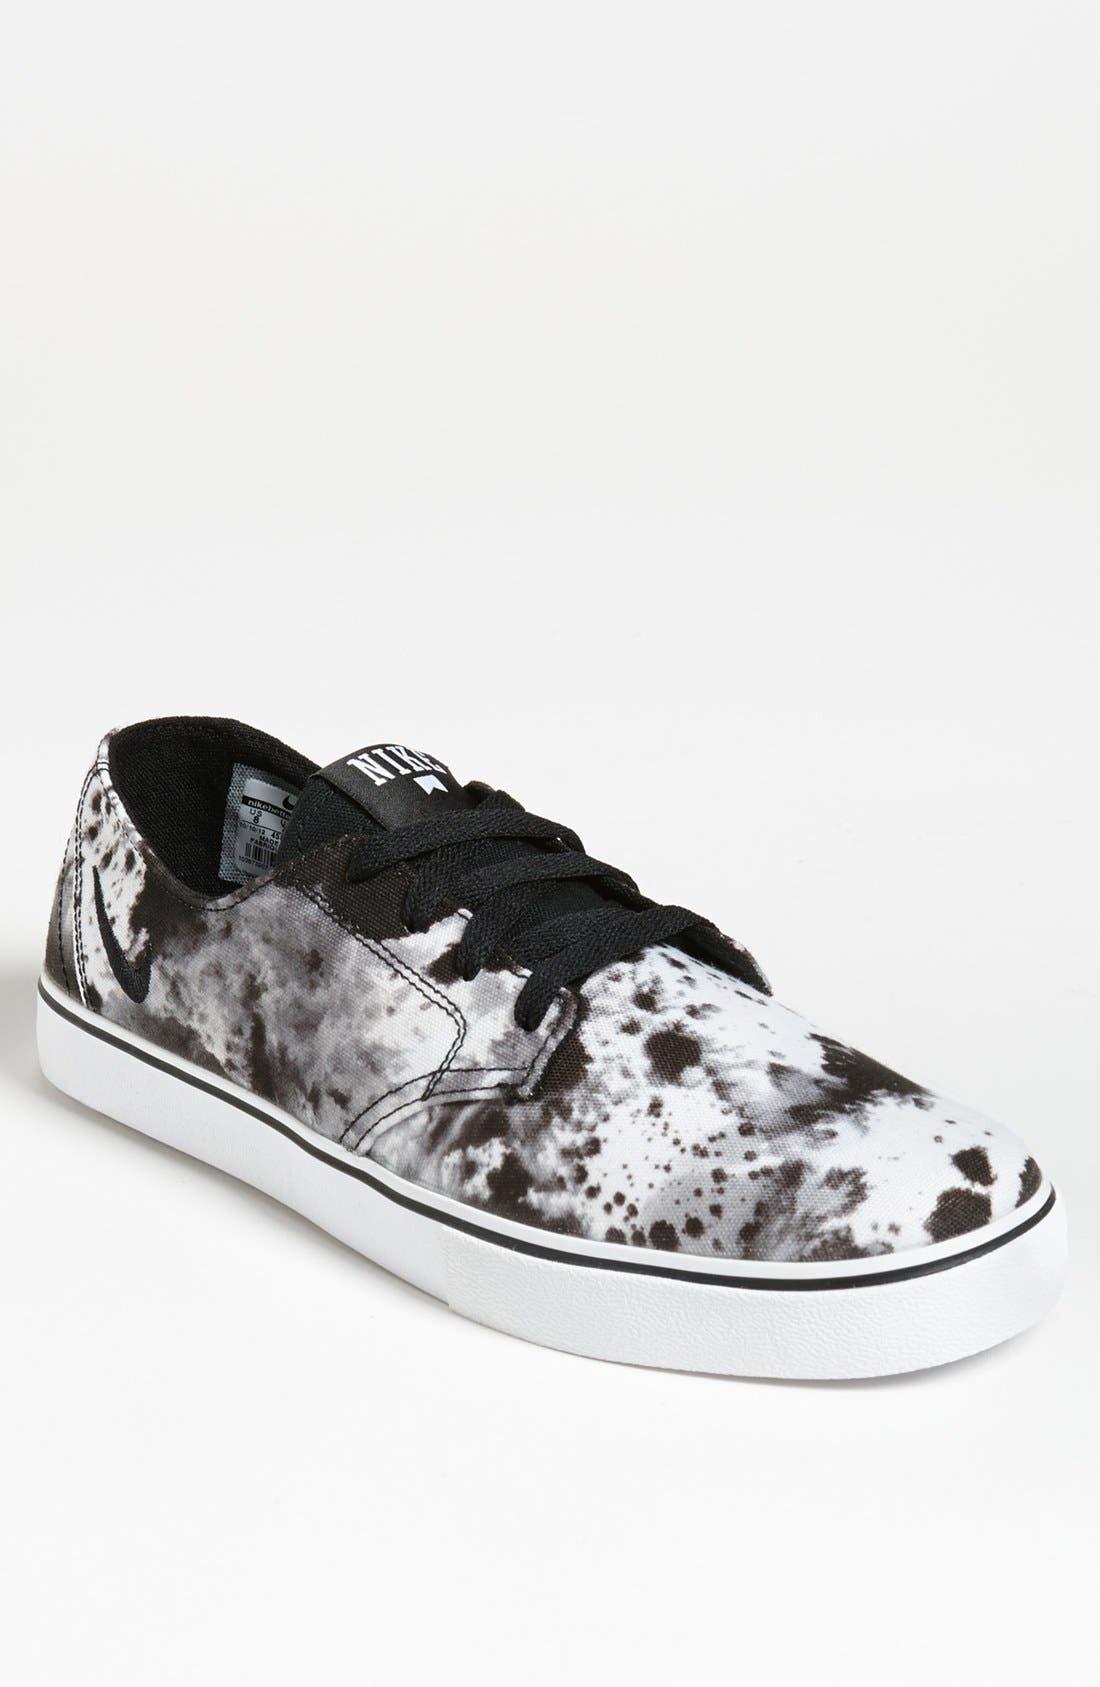 Main Image - Nike 'Braata Leather Premium' Sneaker